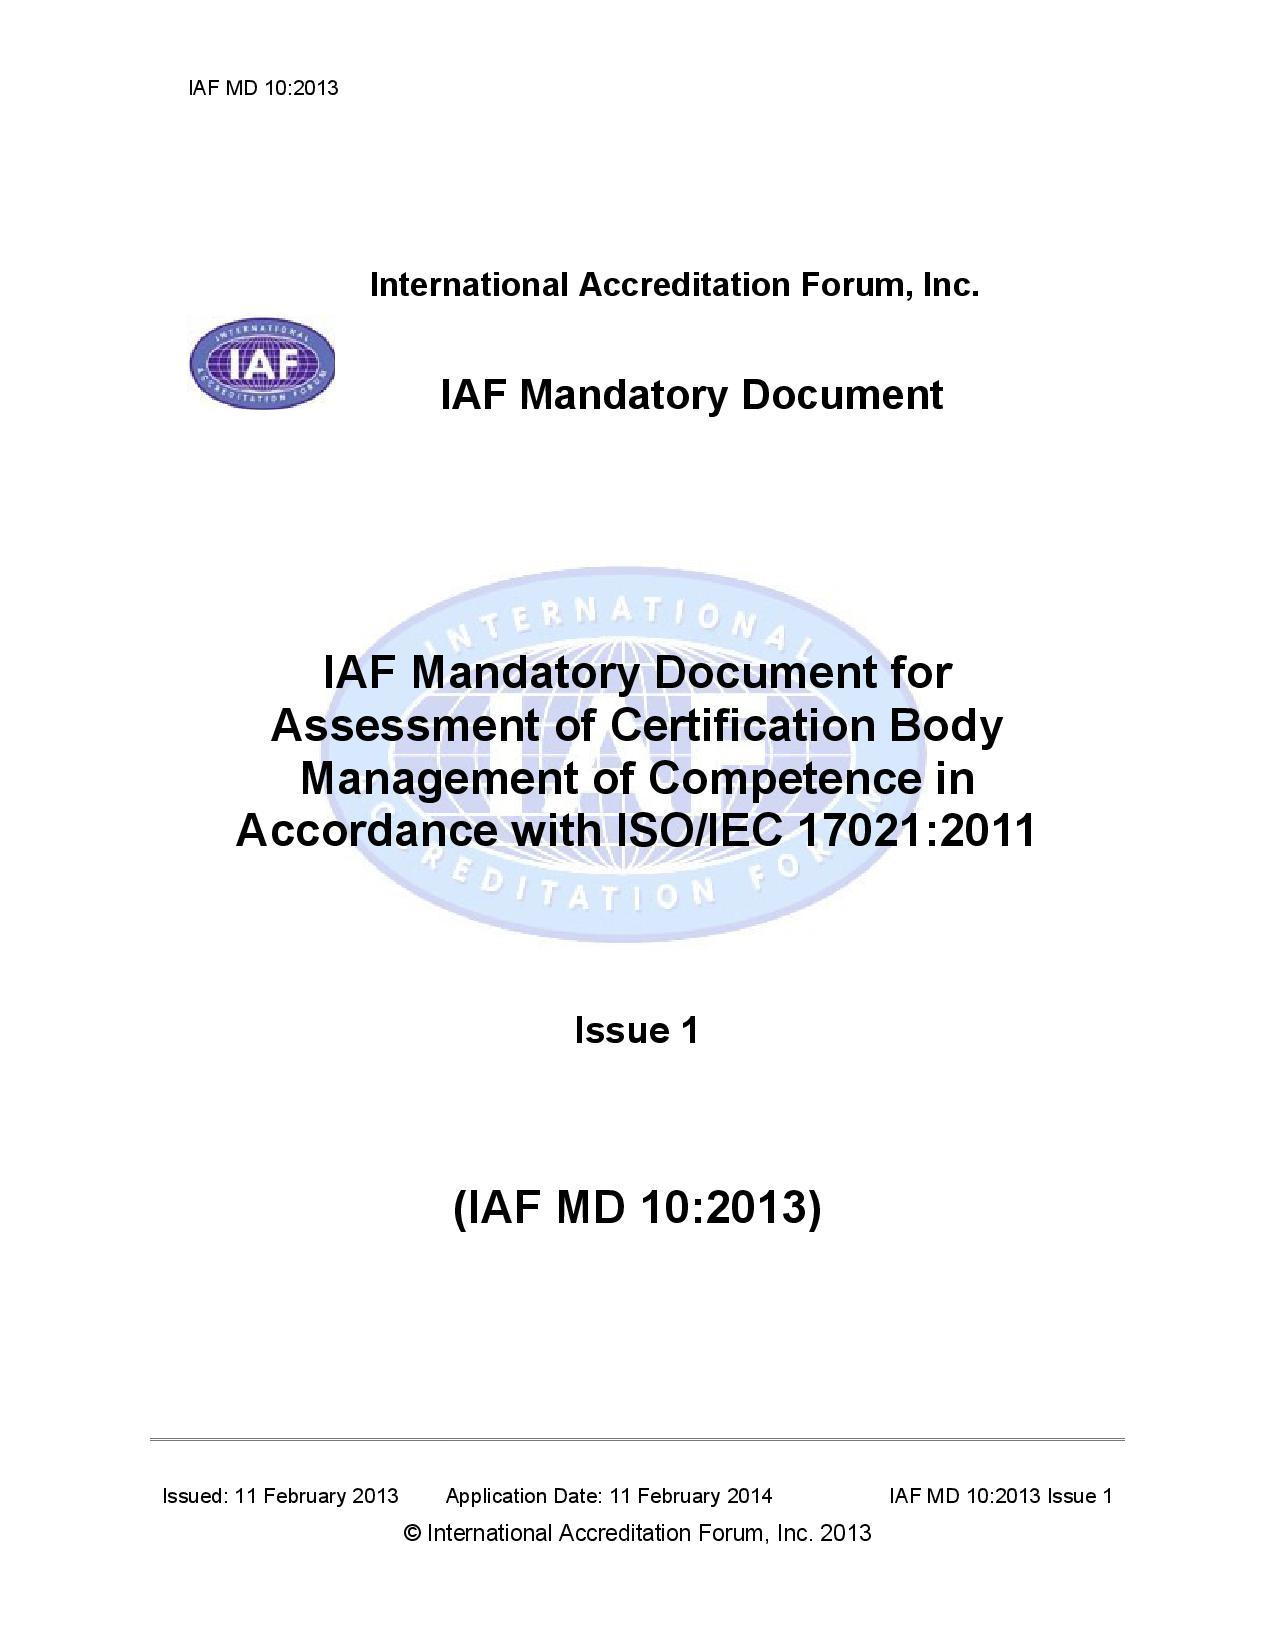 Iaf Mandatory Document On Assessment Of Certification Body